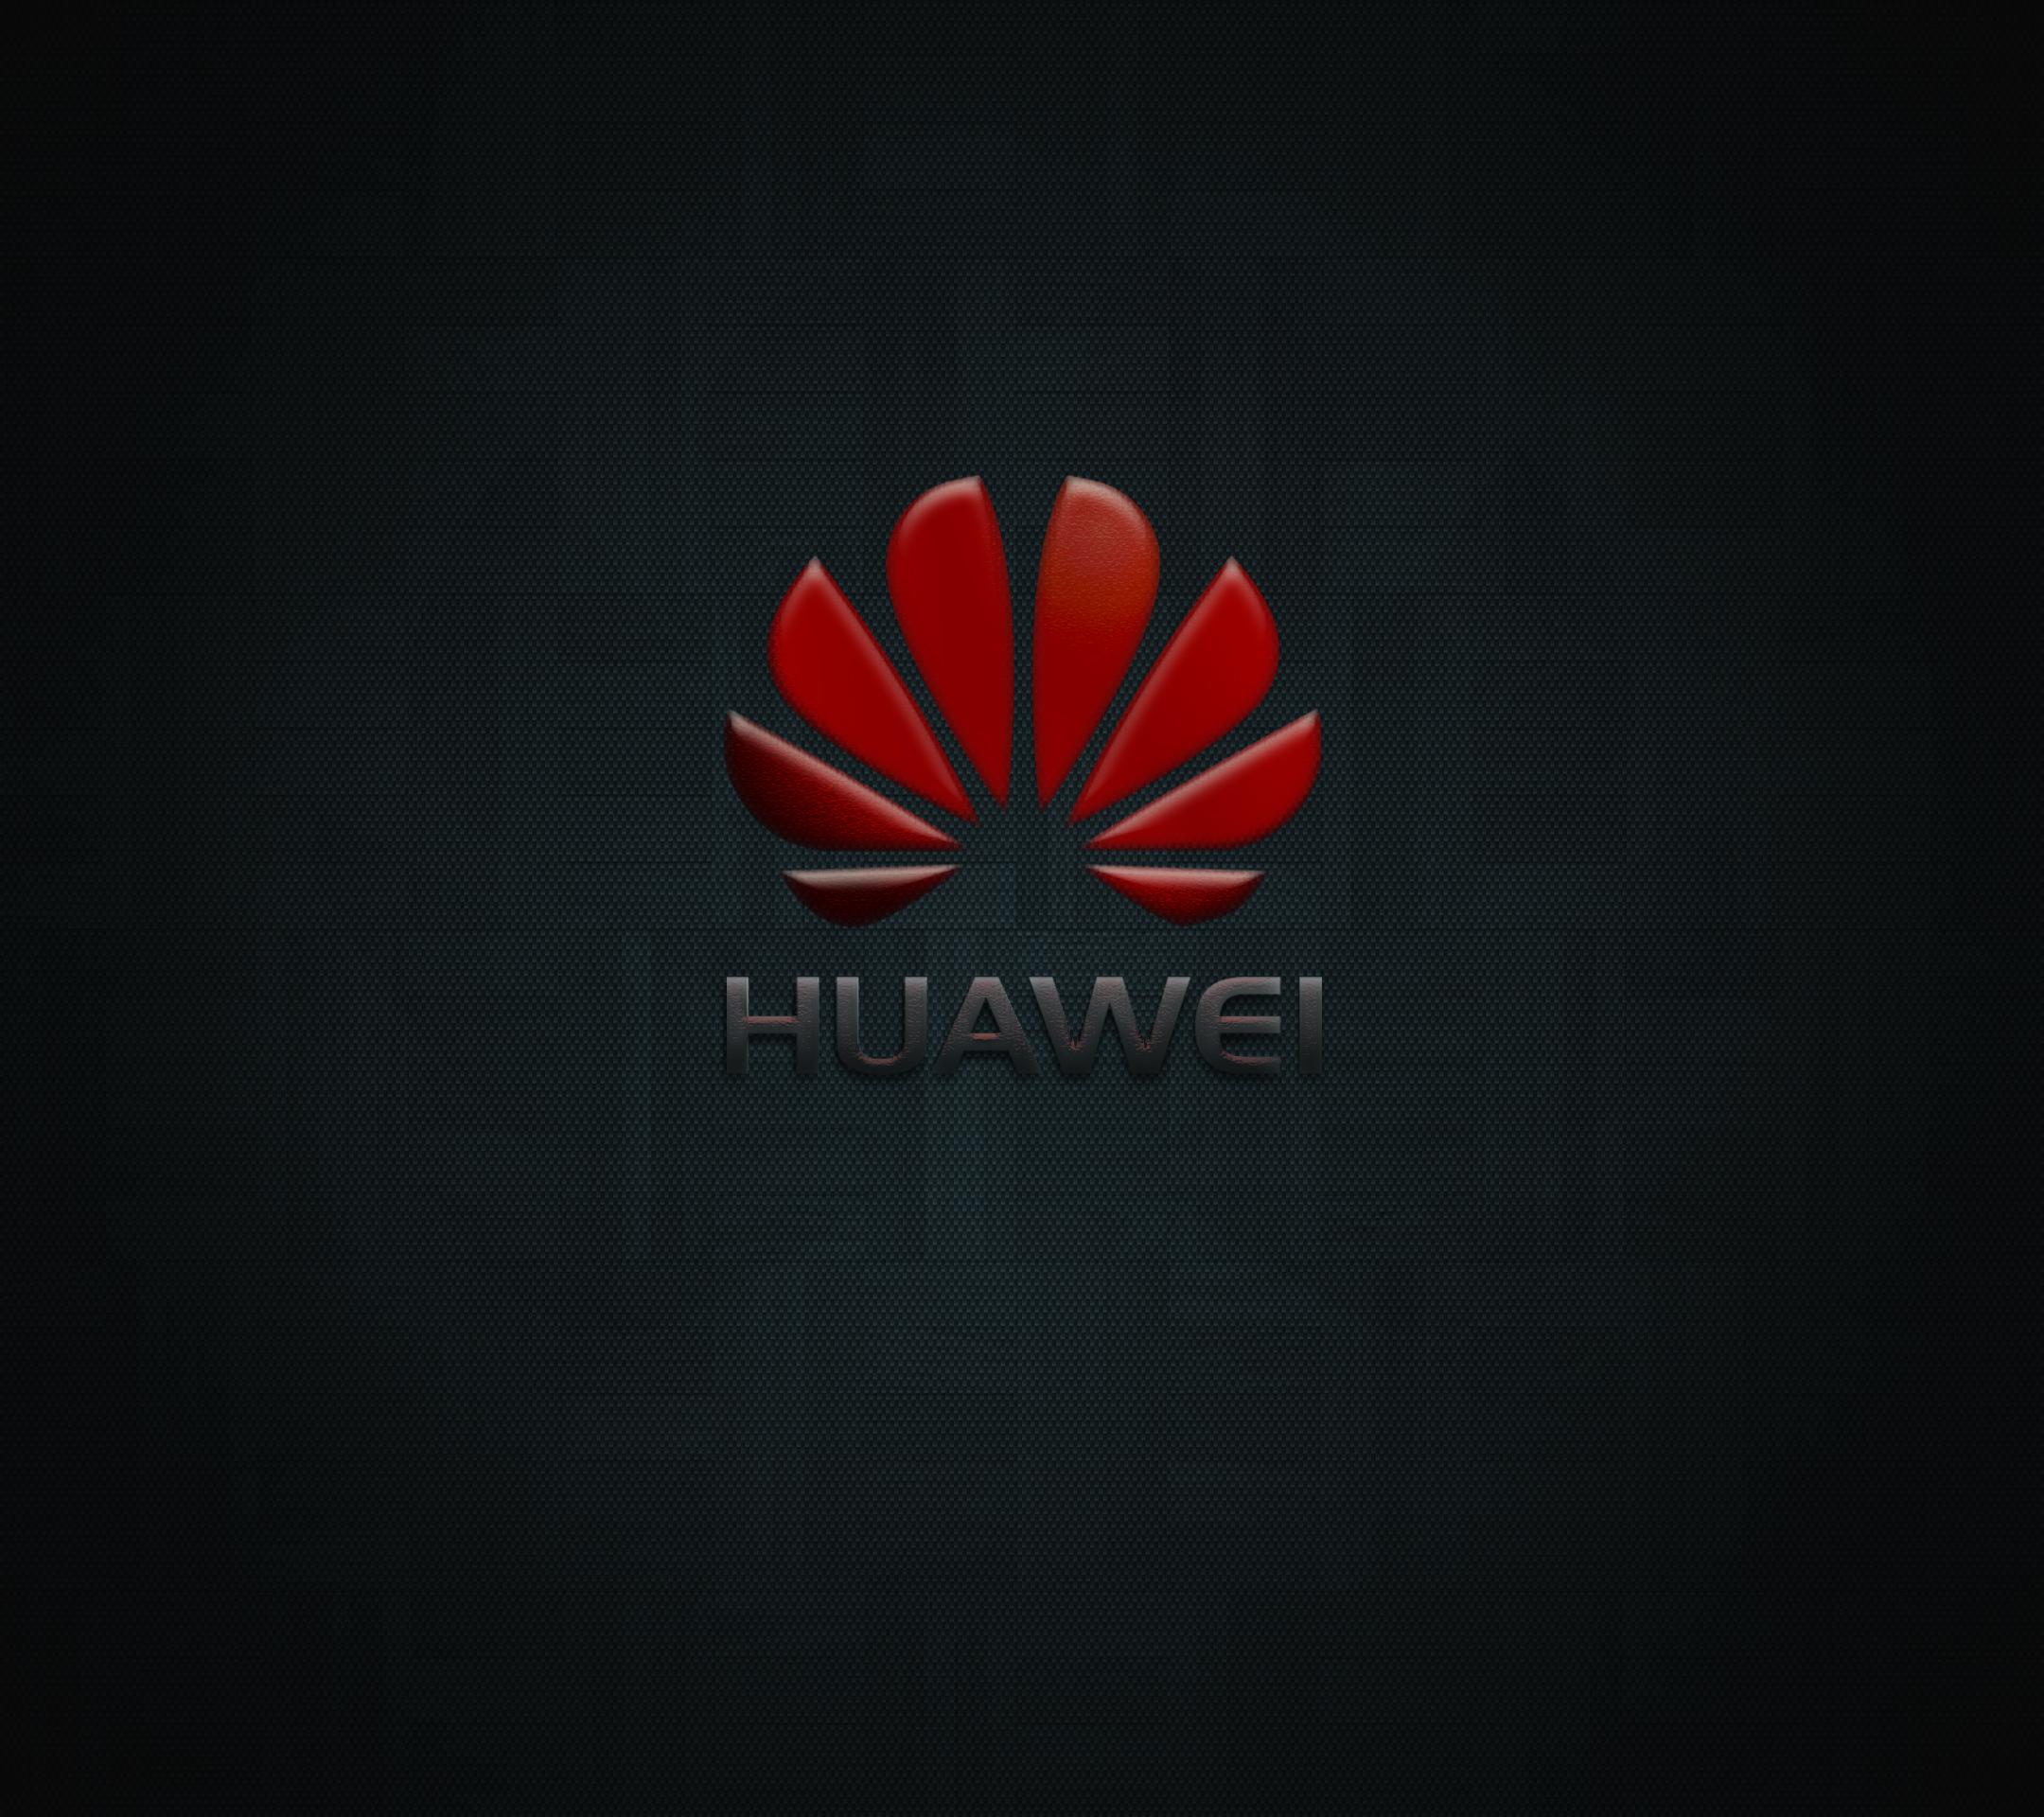 Huawei Logo Wallpaper 06 By Leg Amk End On Deviantart